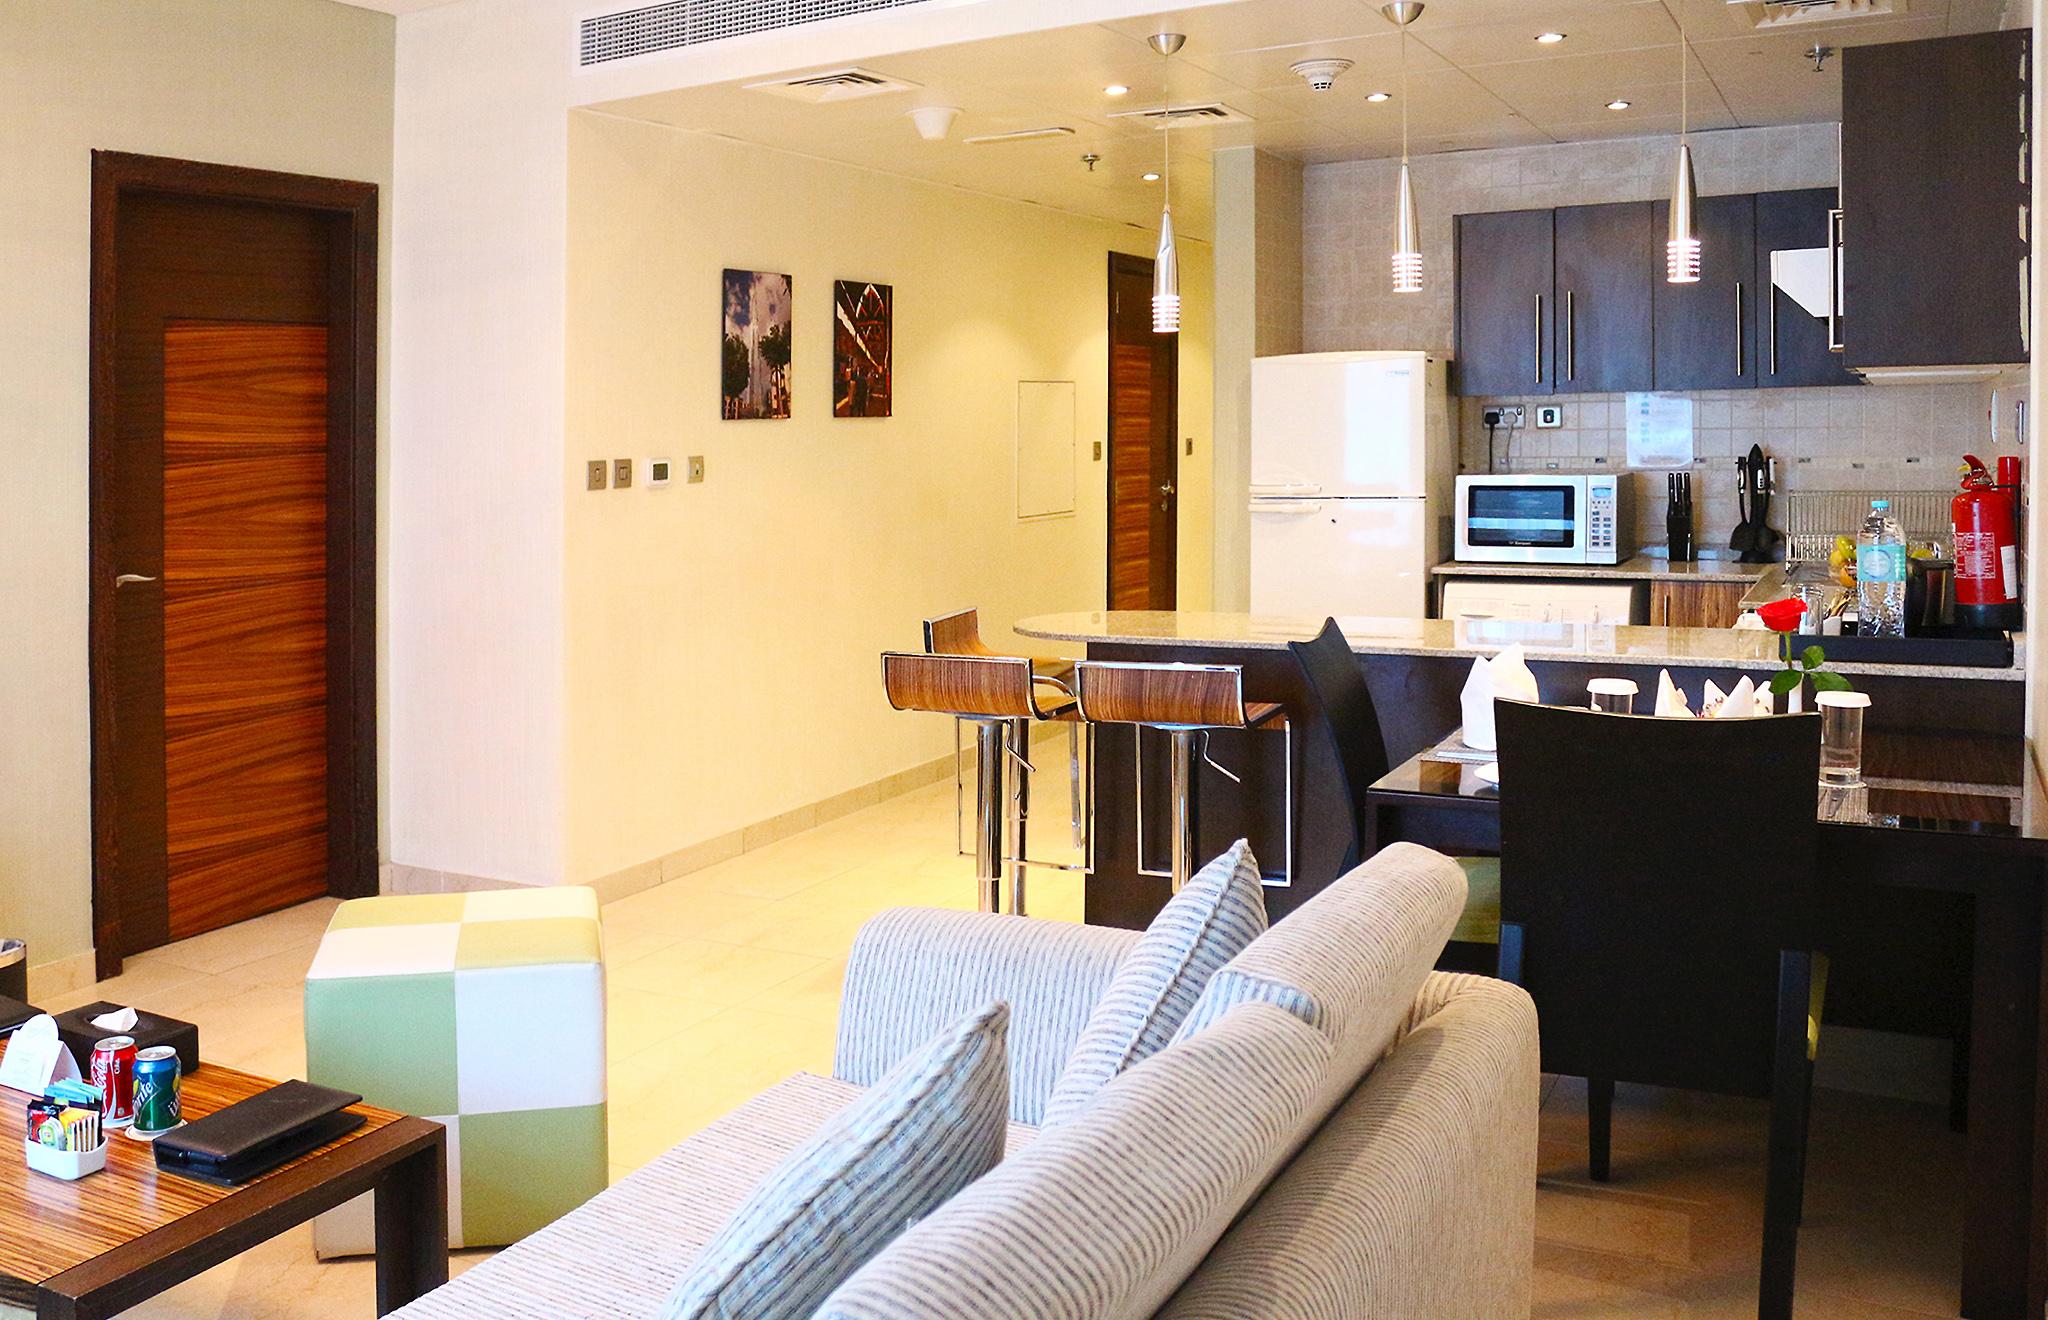 Image CPHA_1BR_Standard_Dining_Living_Area.jpg